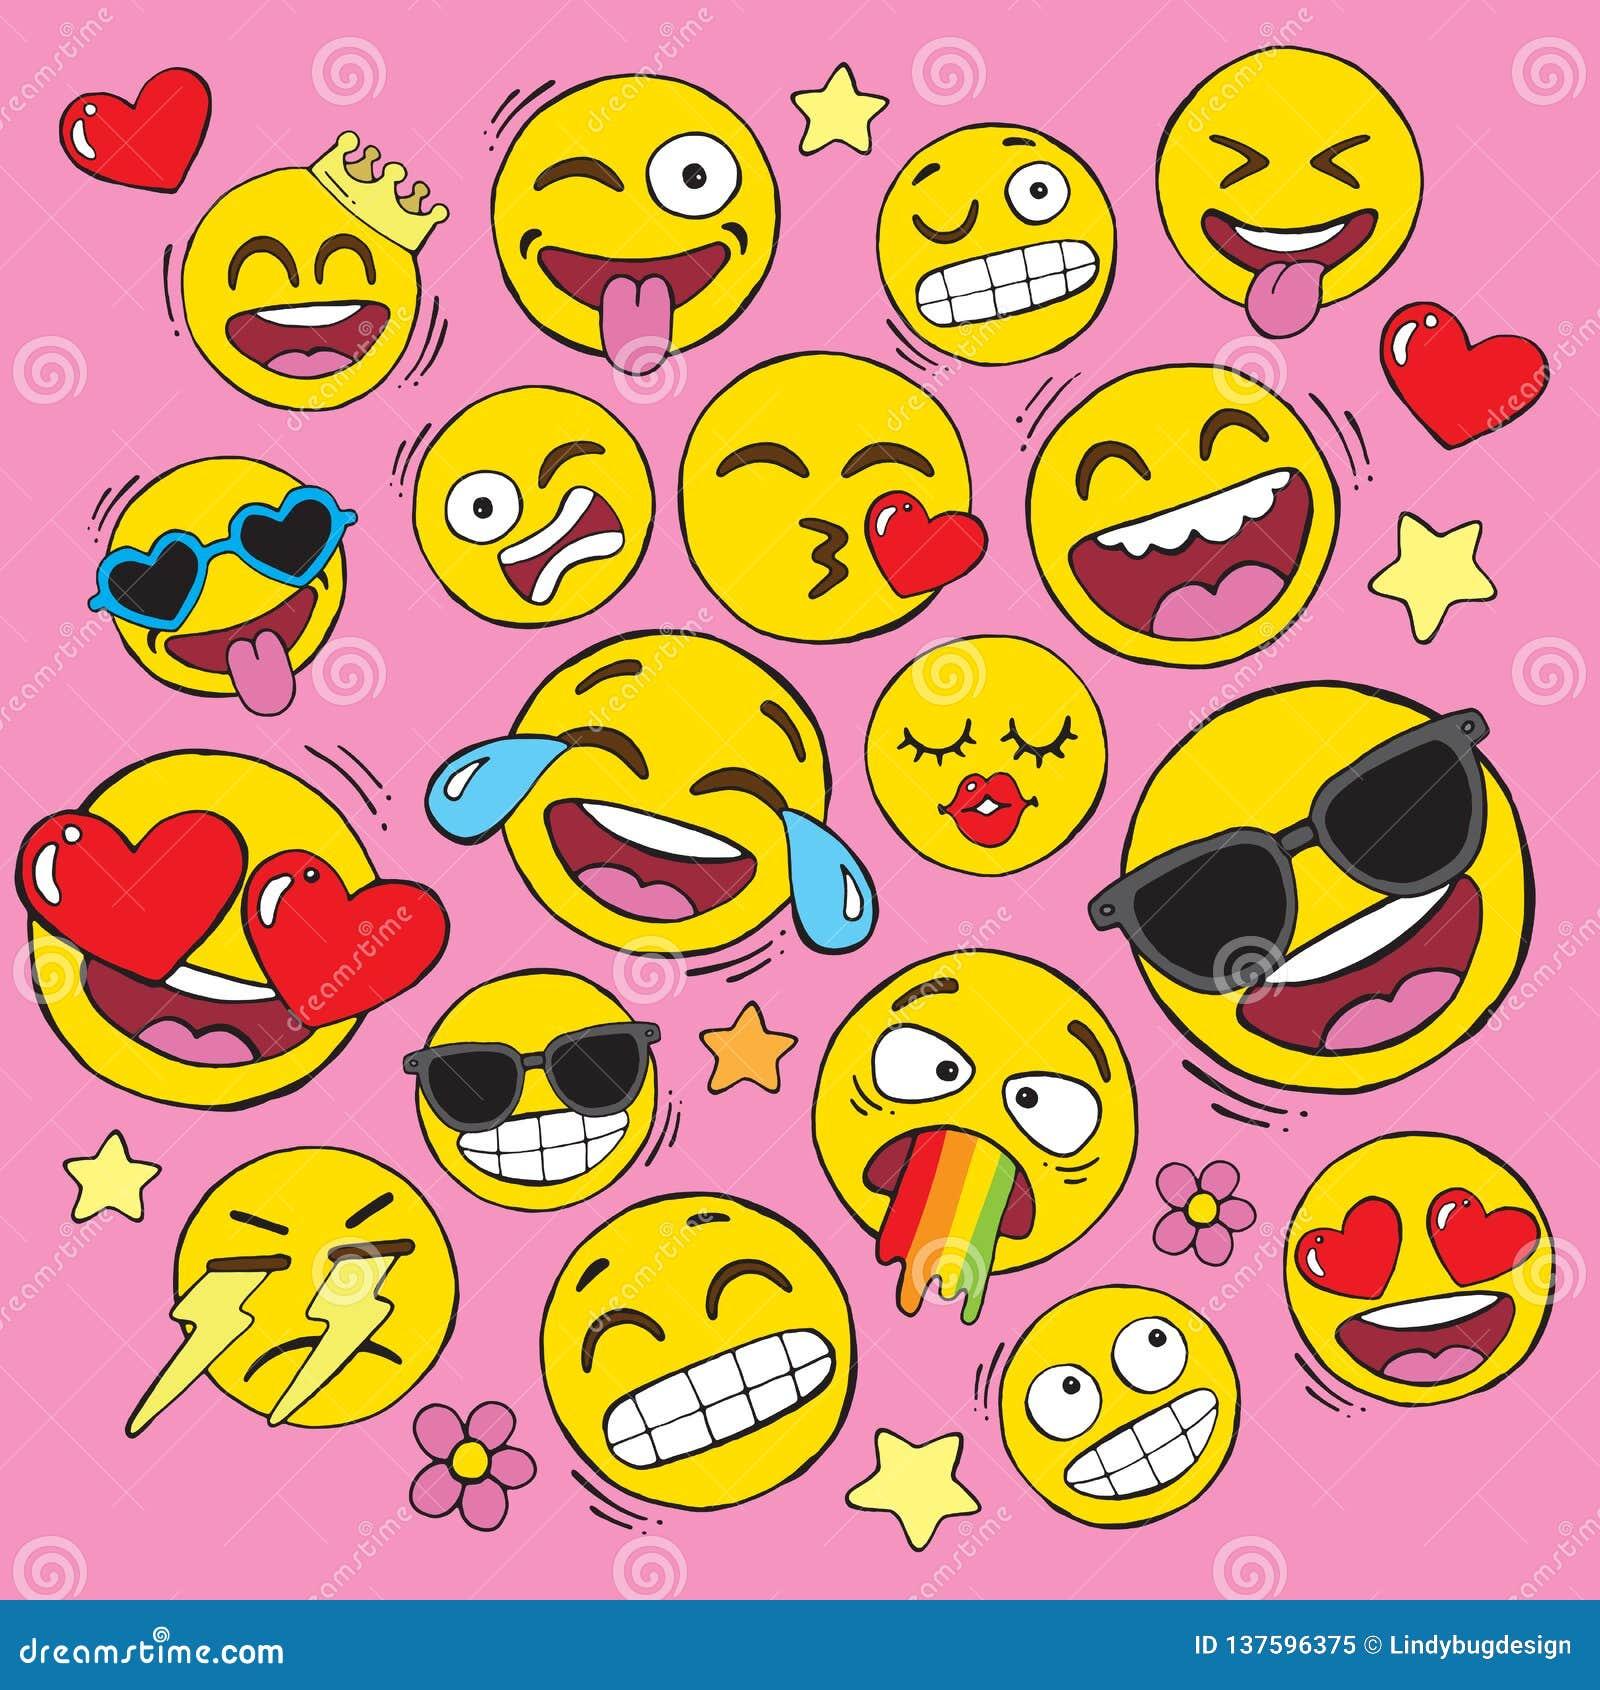 Yellow Smiley Faceemoji Bobbydaleearnhardt.com